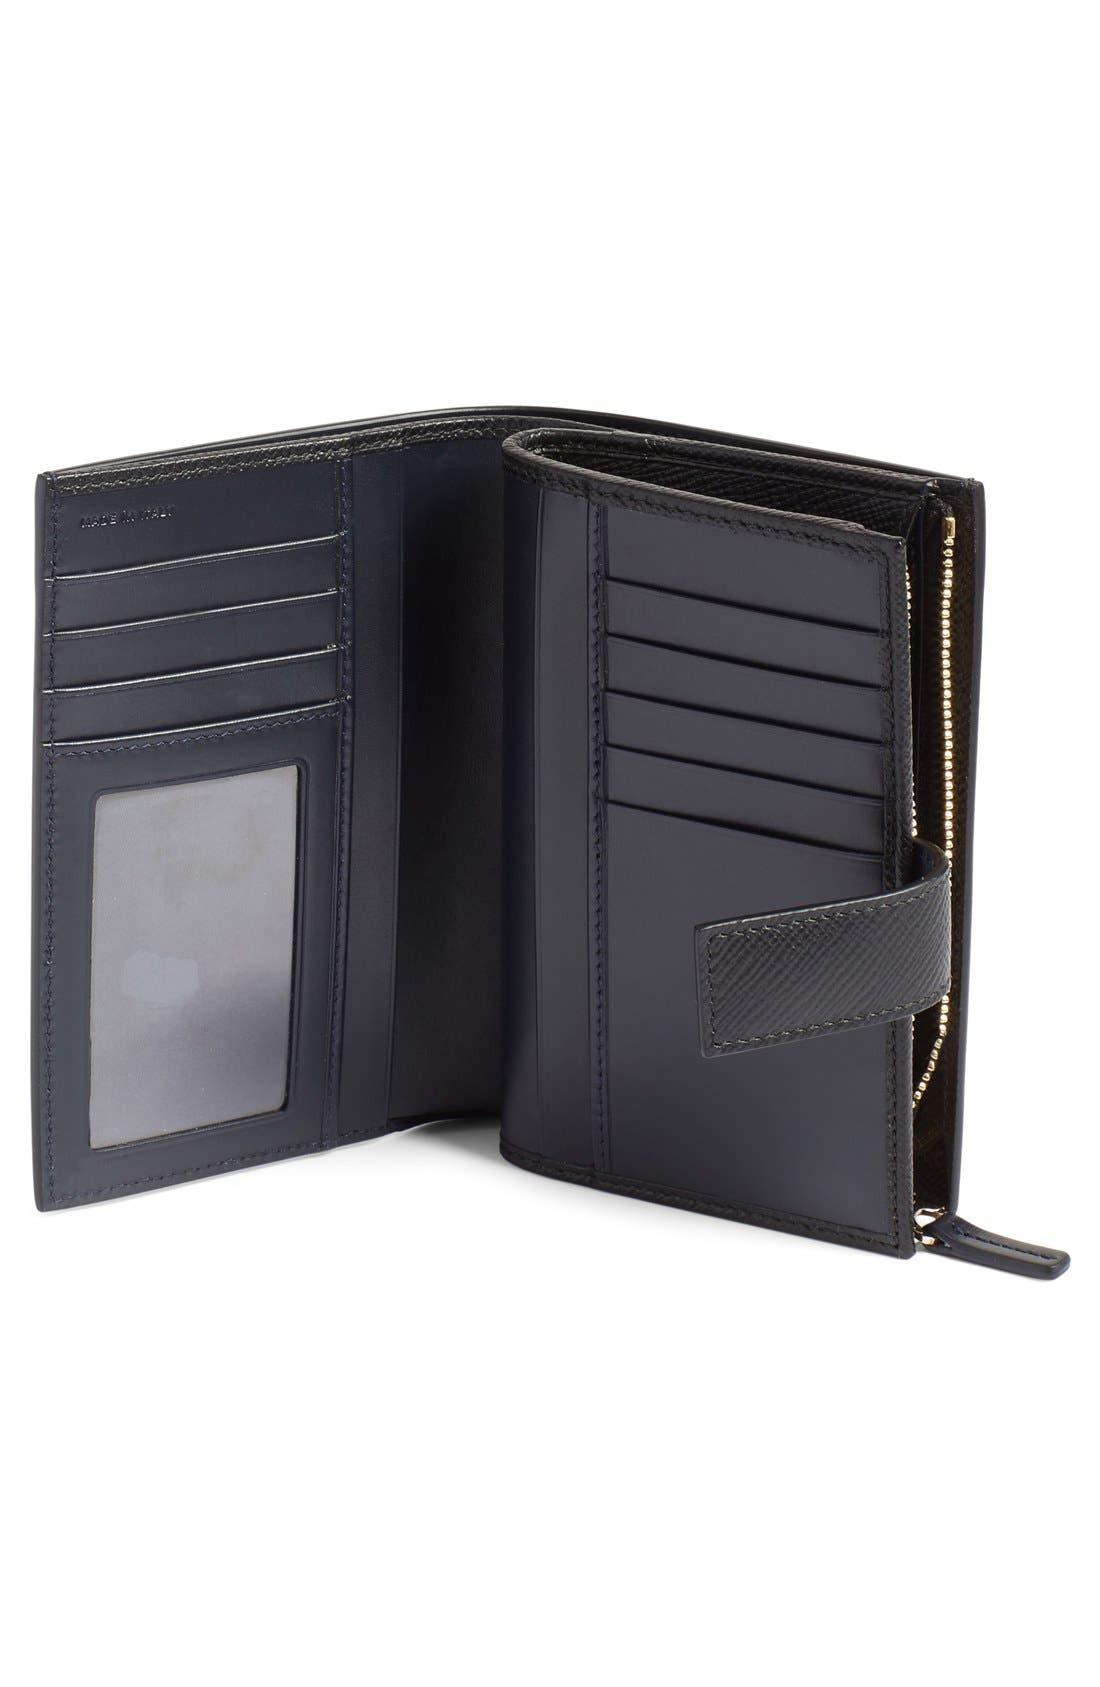 Alternate Image 2  - Smythson 'Medium' Continental Wallet